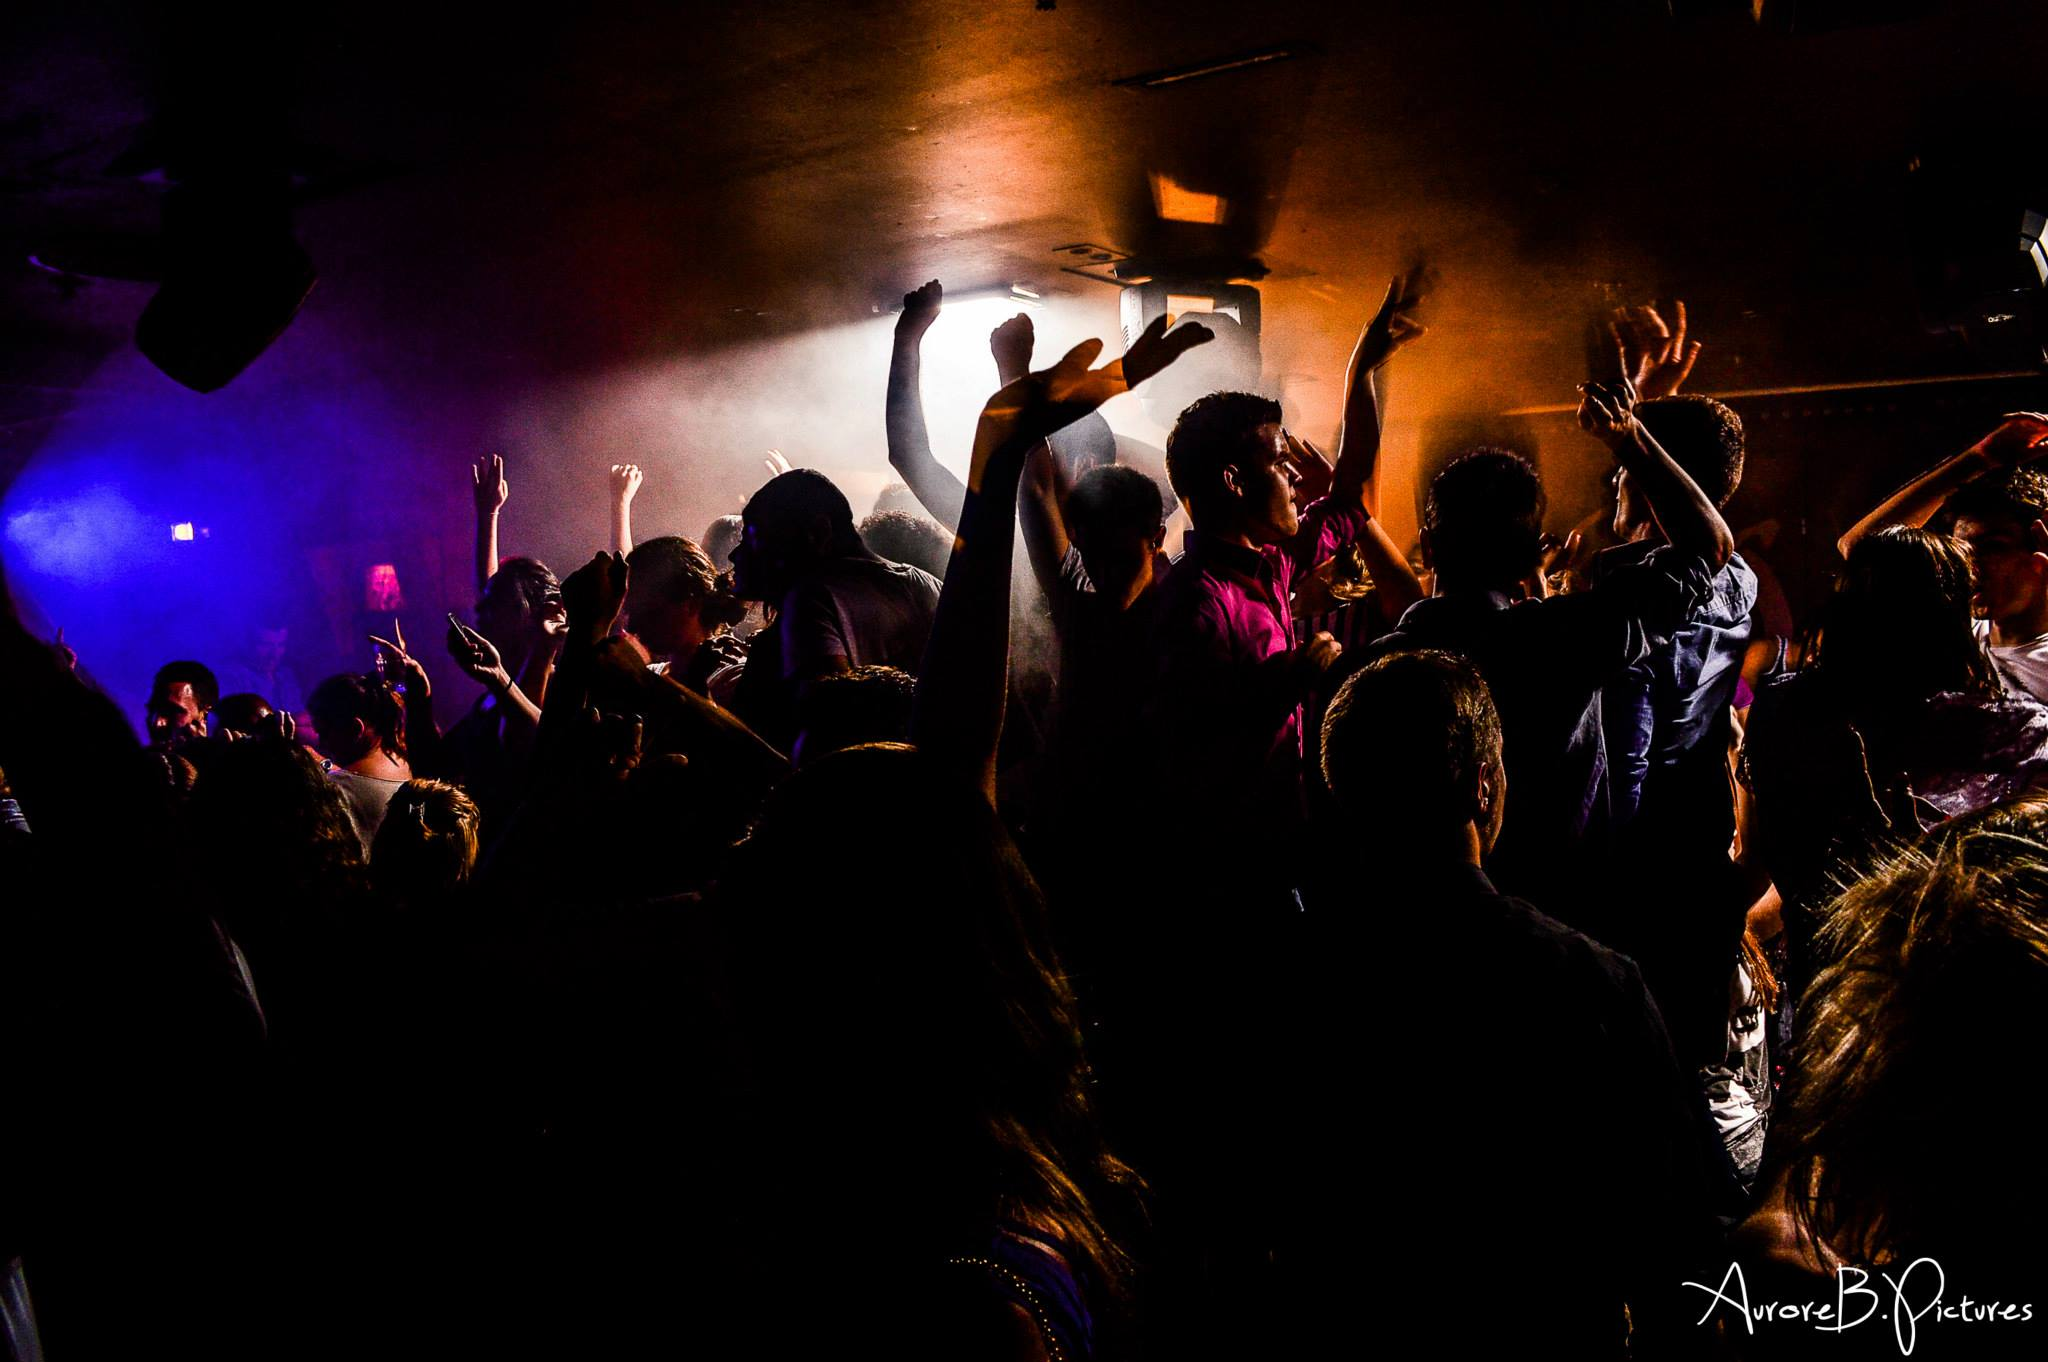 AuroreB.Pictures - Clubbing